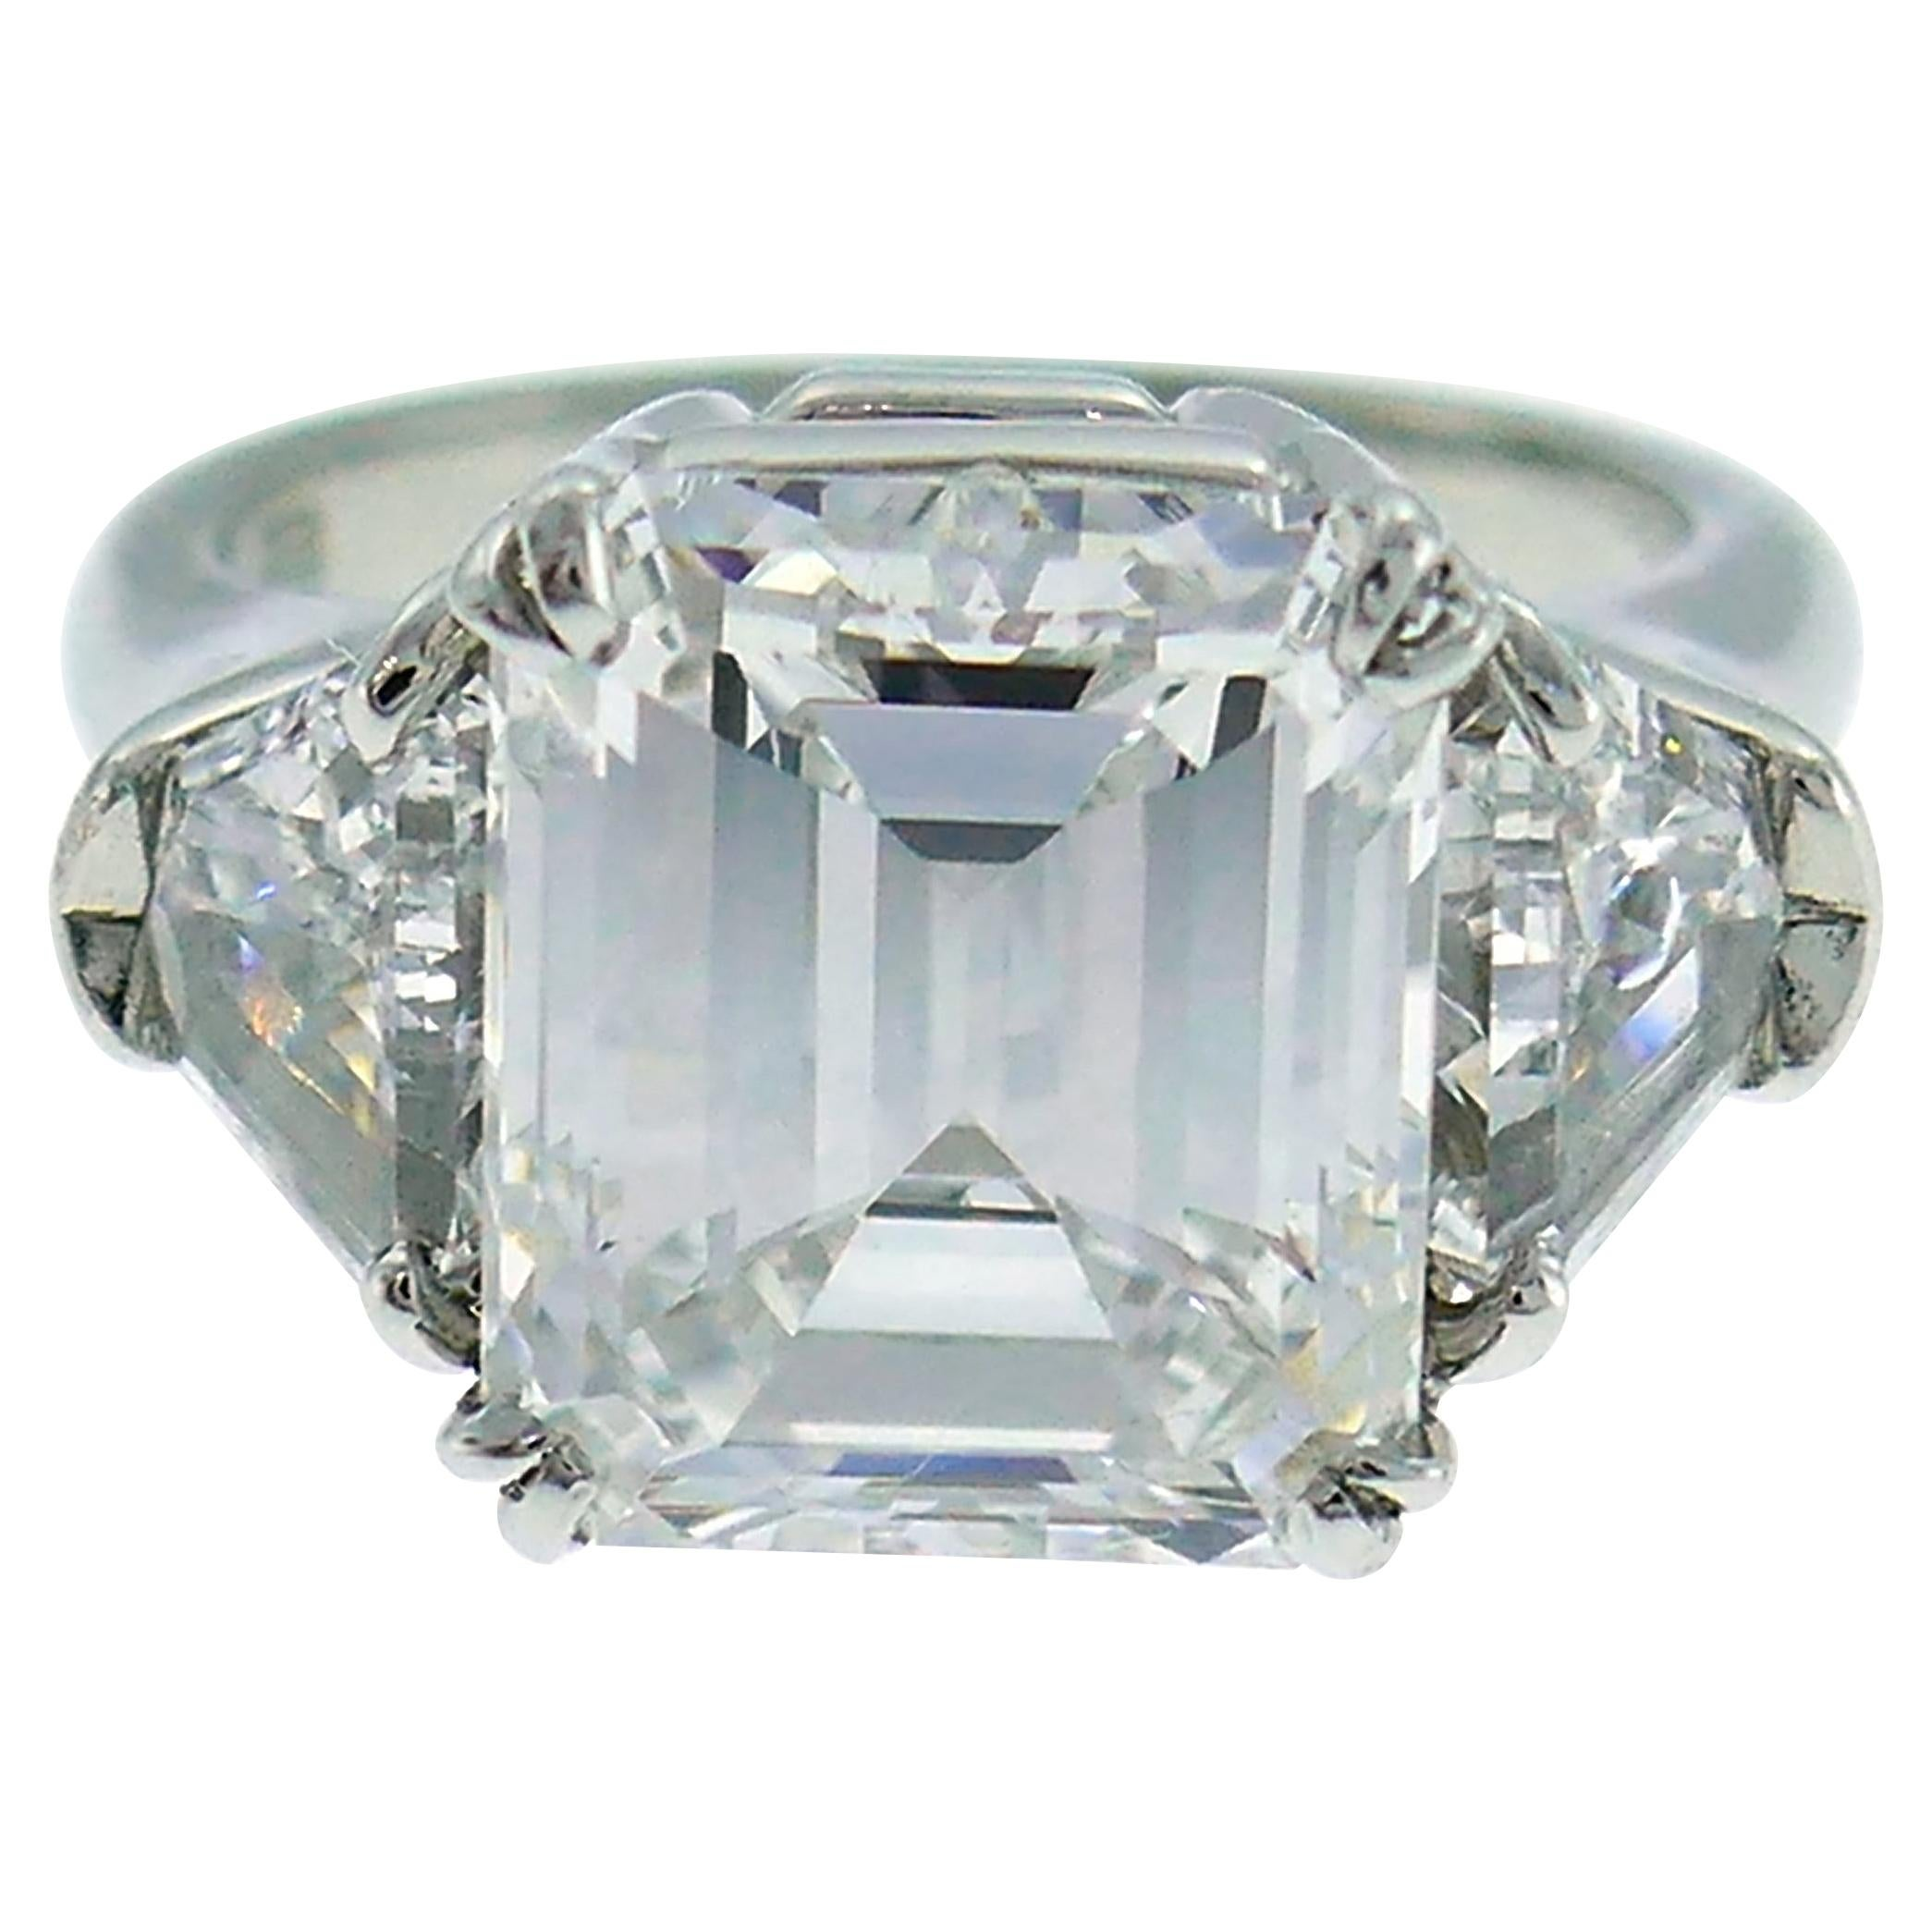 Harry Winston Diamond Platinum Ring 4.03 Carat Emerald Cut E/VS1 GIA